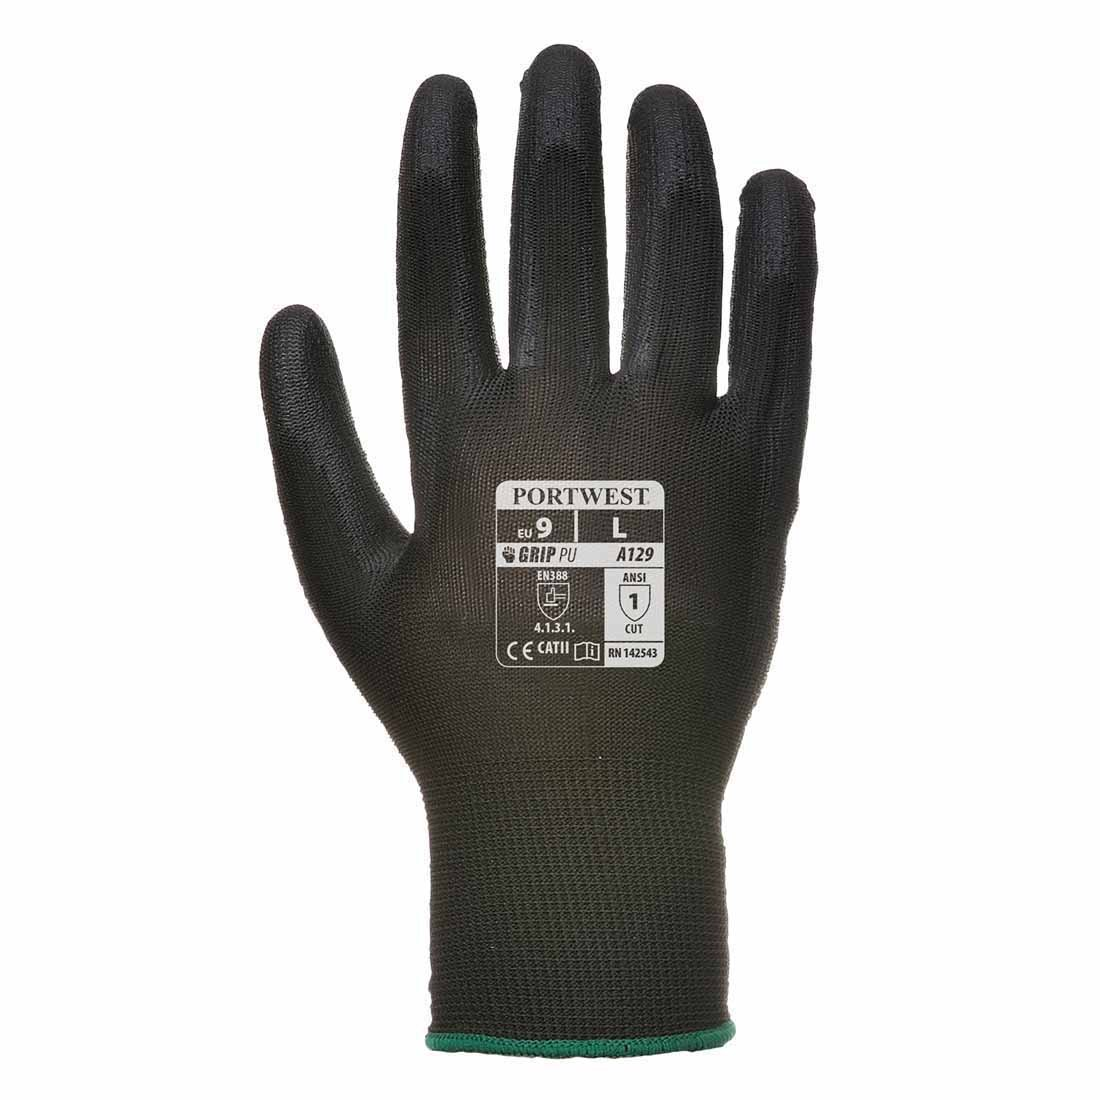 Portwest - PU Palm Glove (12 Pair Pack) - Black - X-Small A129BKRXS